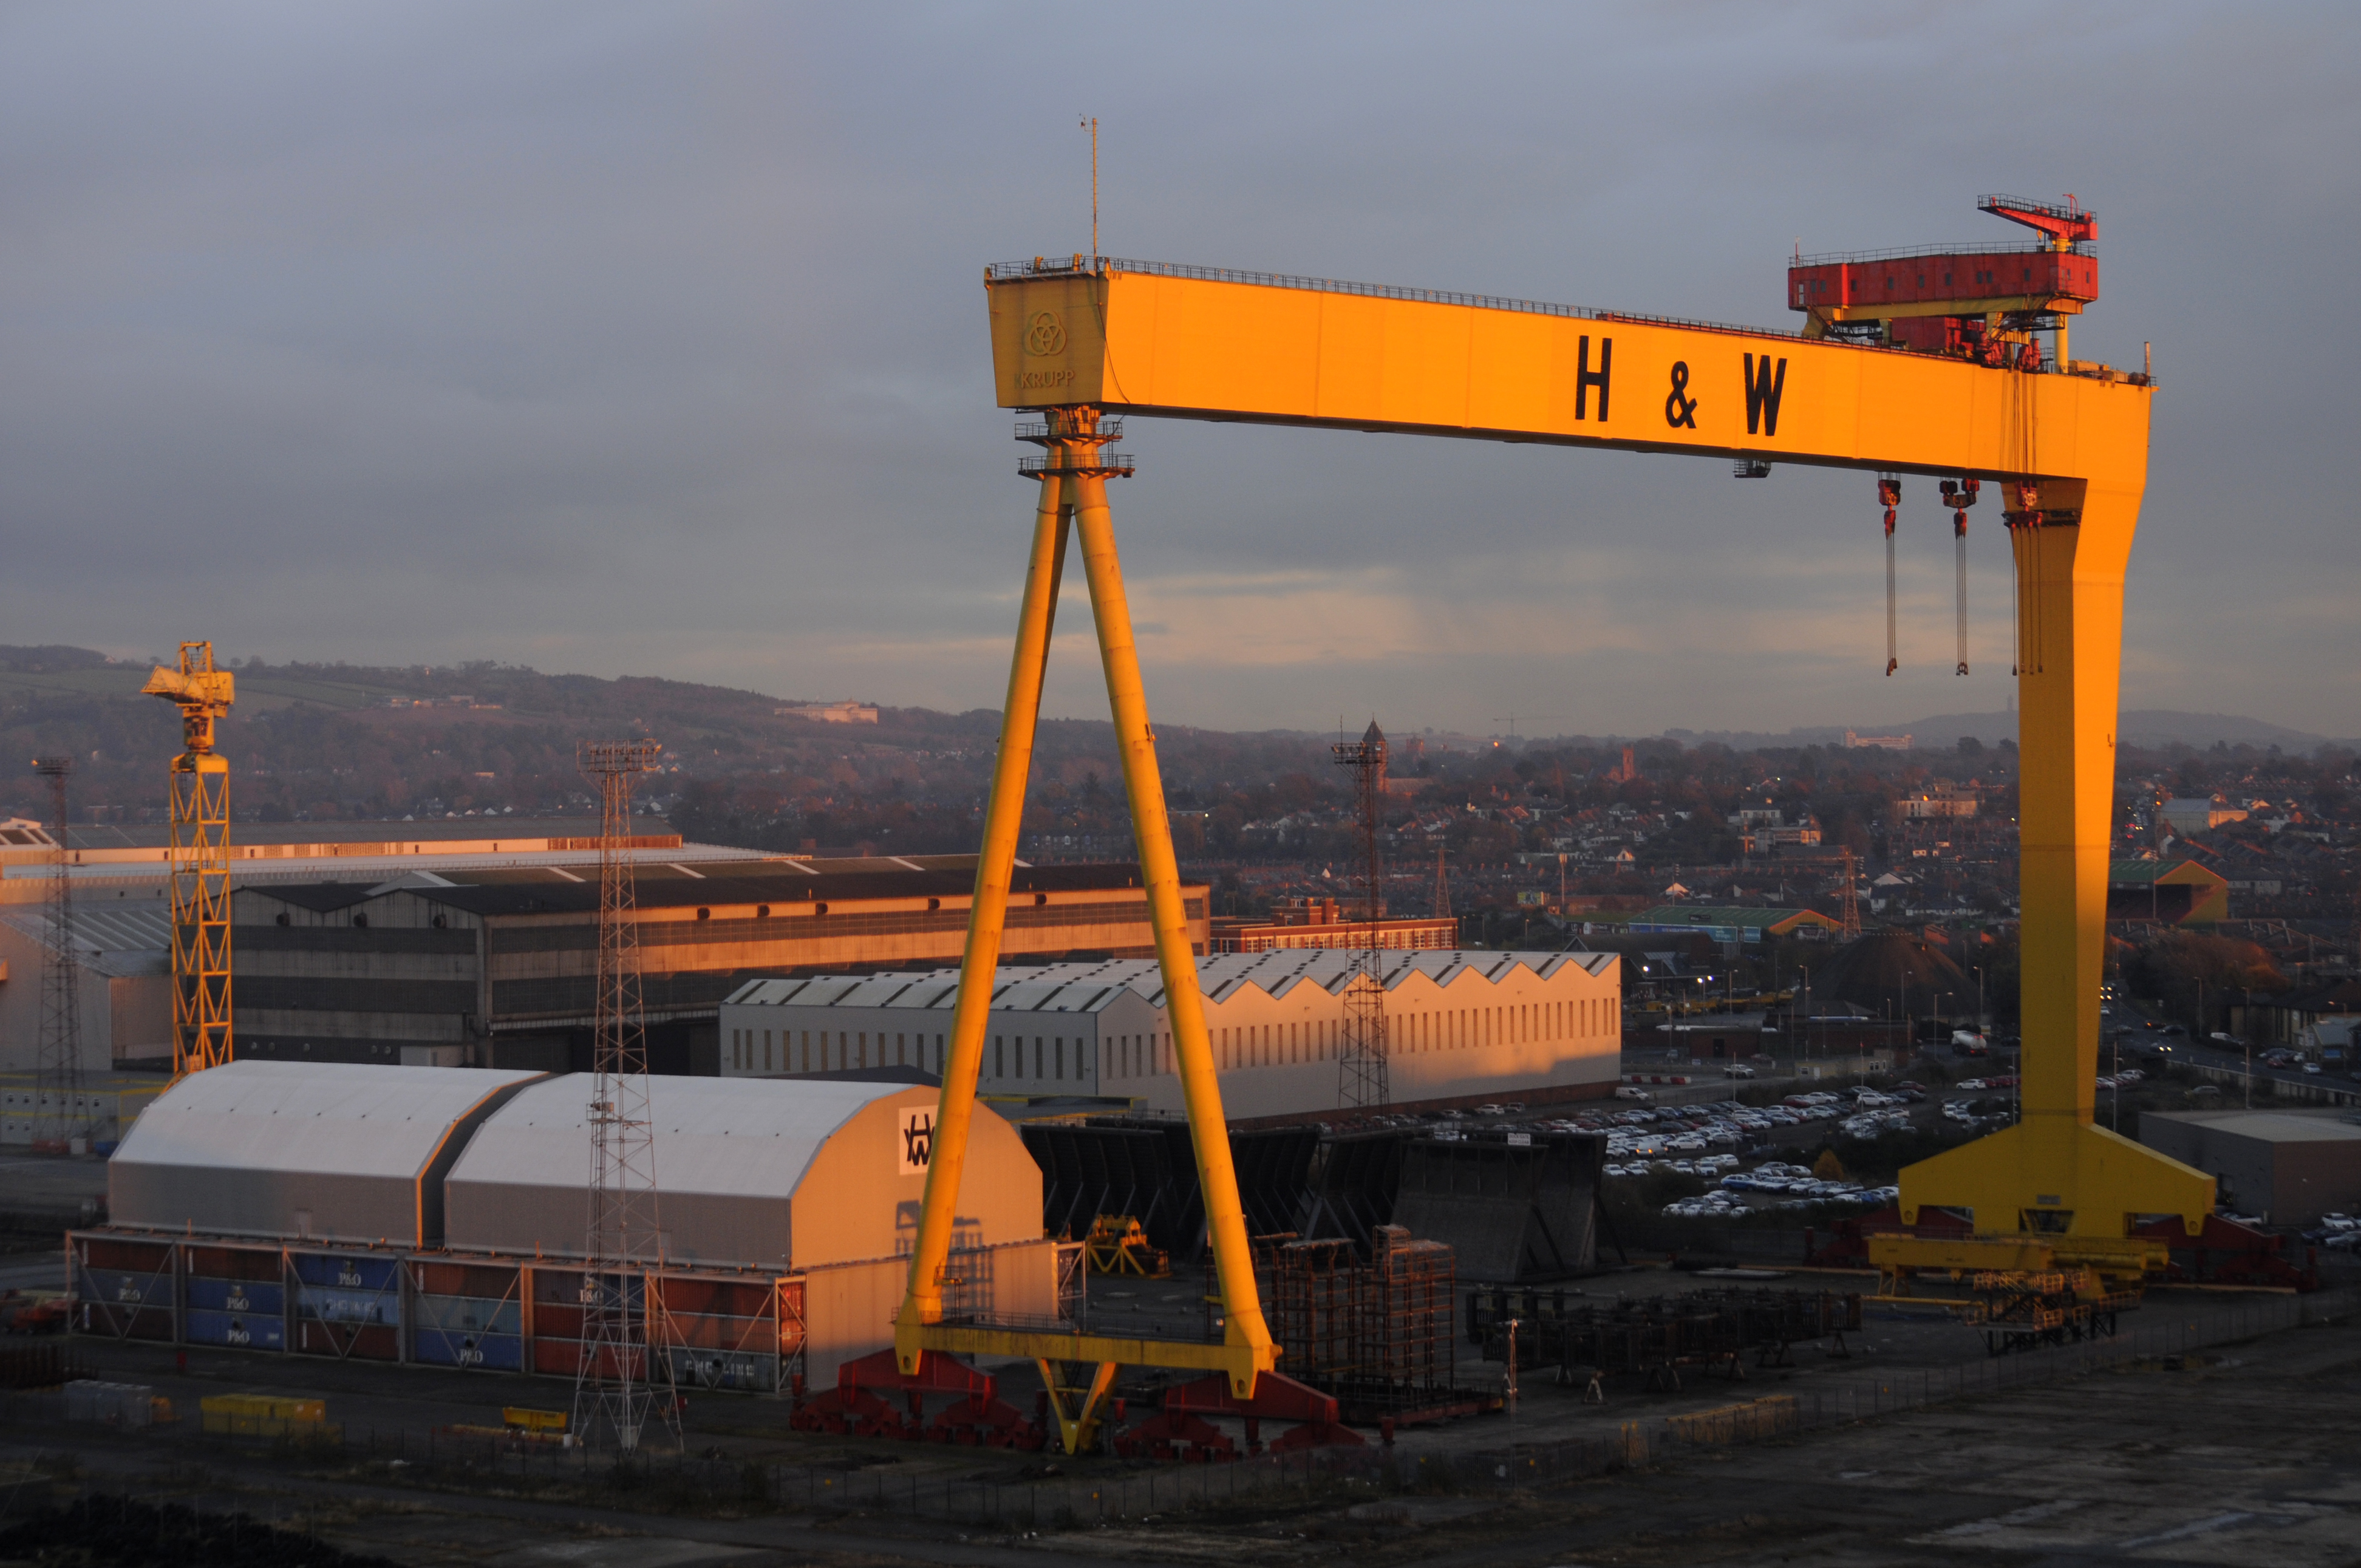 Harland & Wolff Crane at Sunset